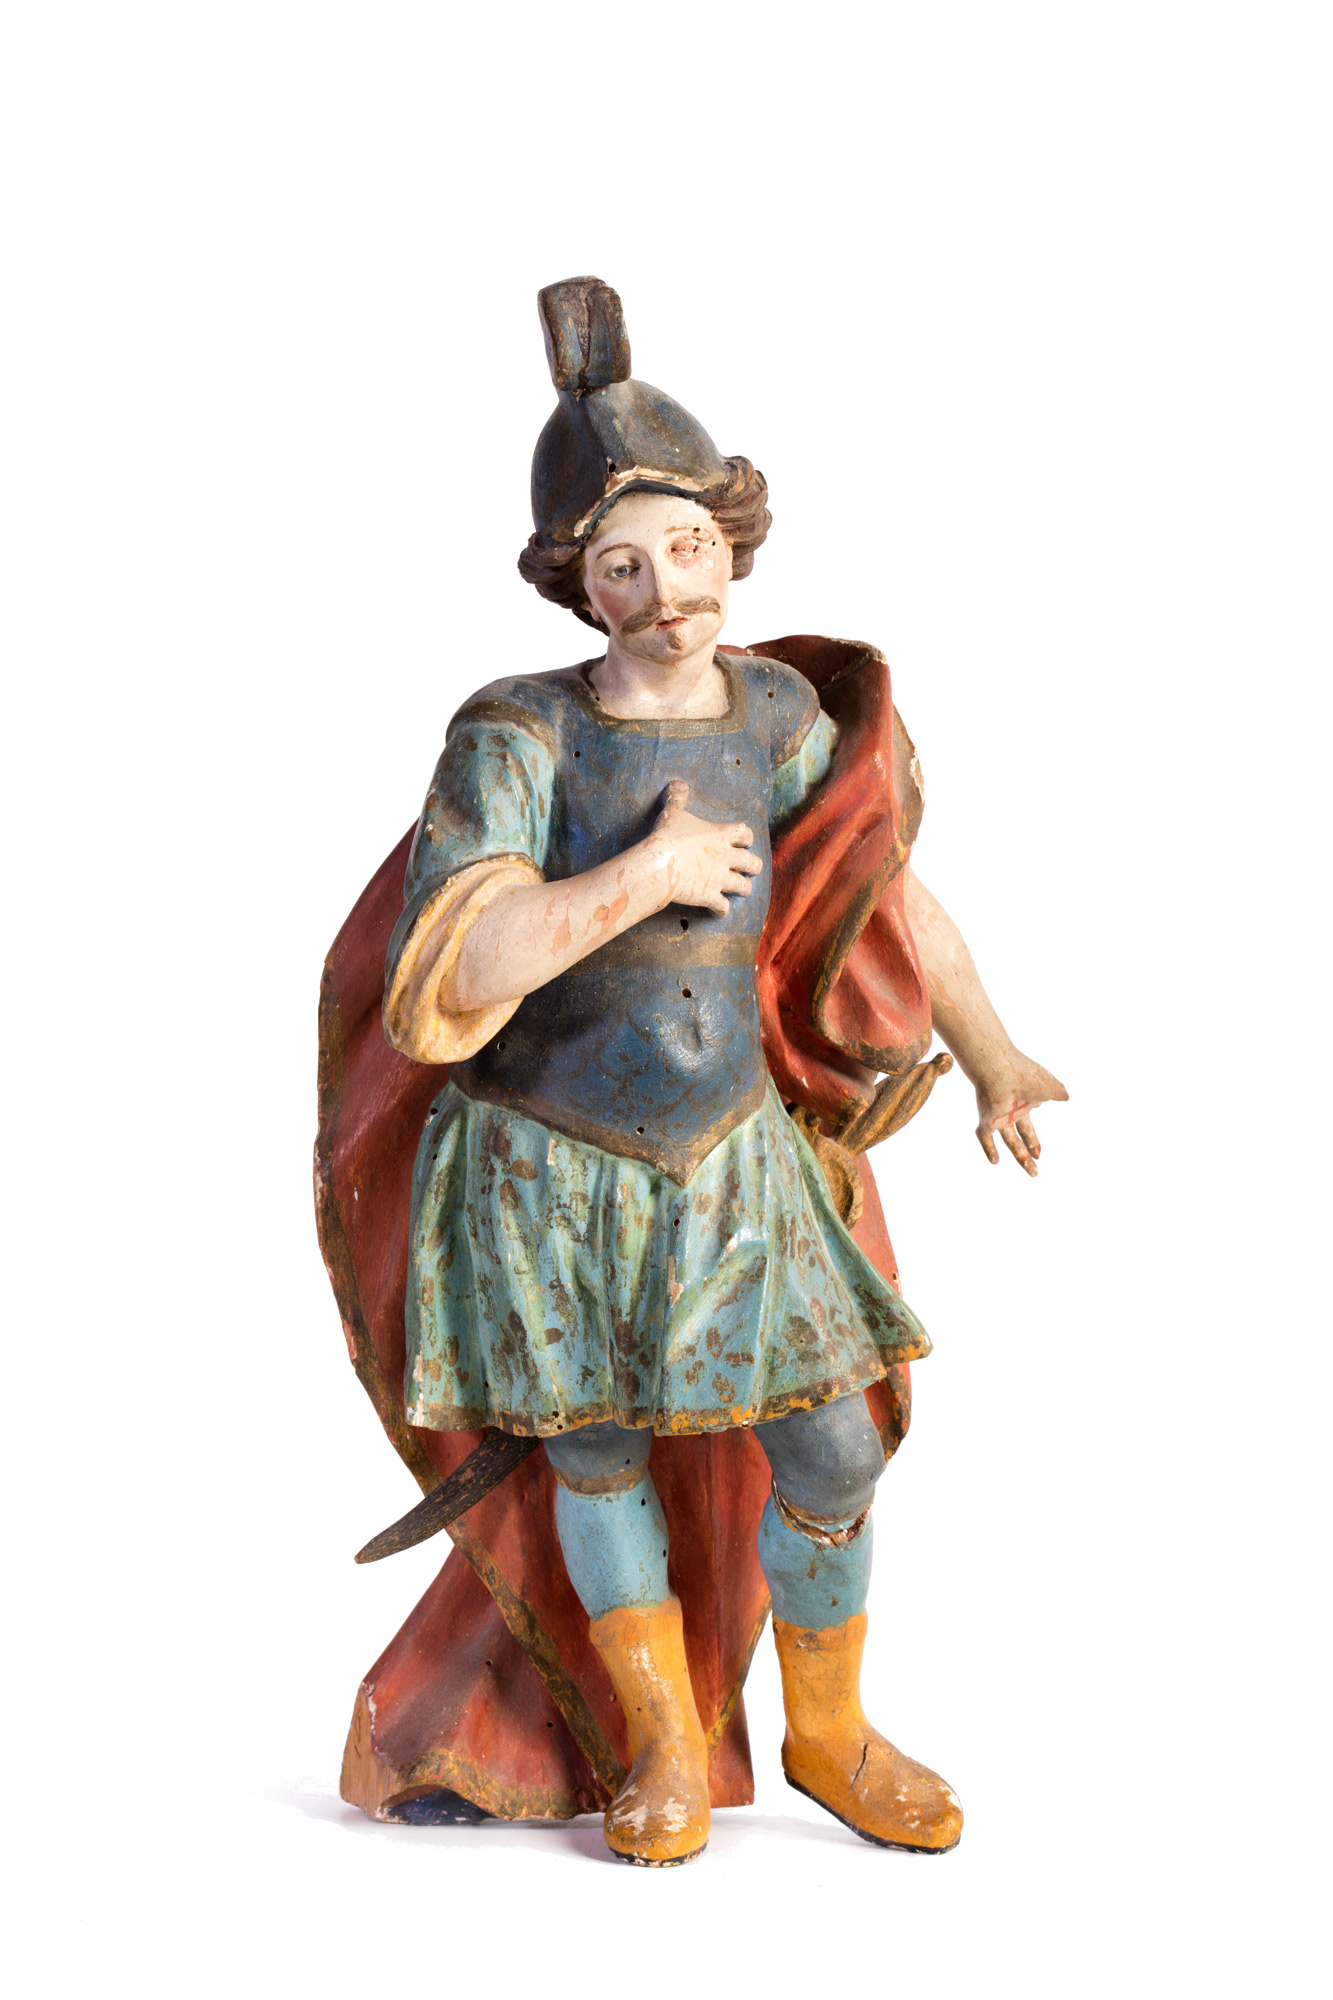 Scultura lignea policroma raffigurante san Longino